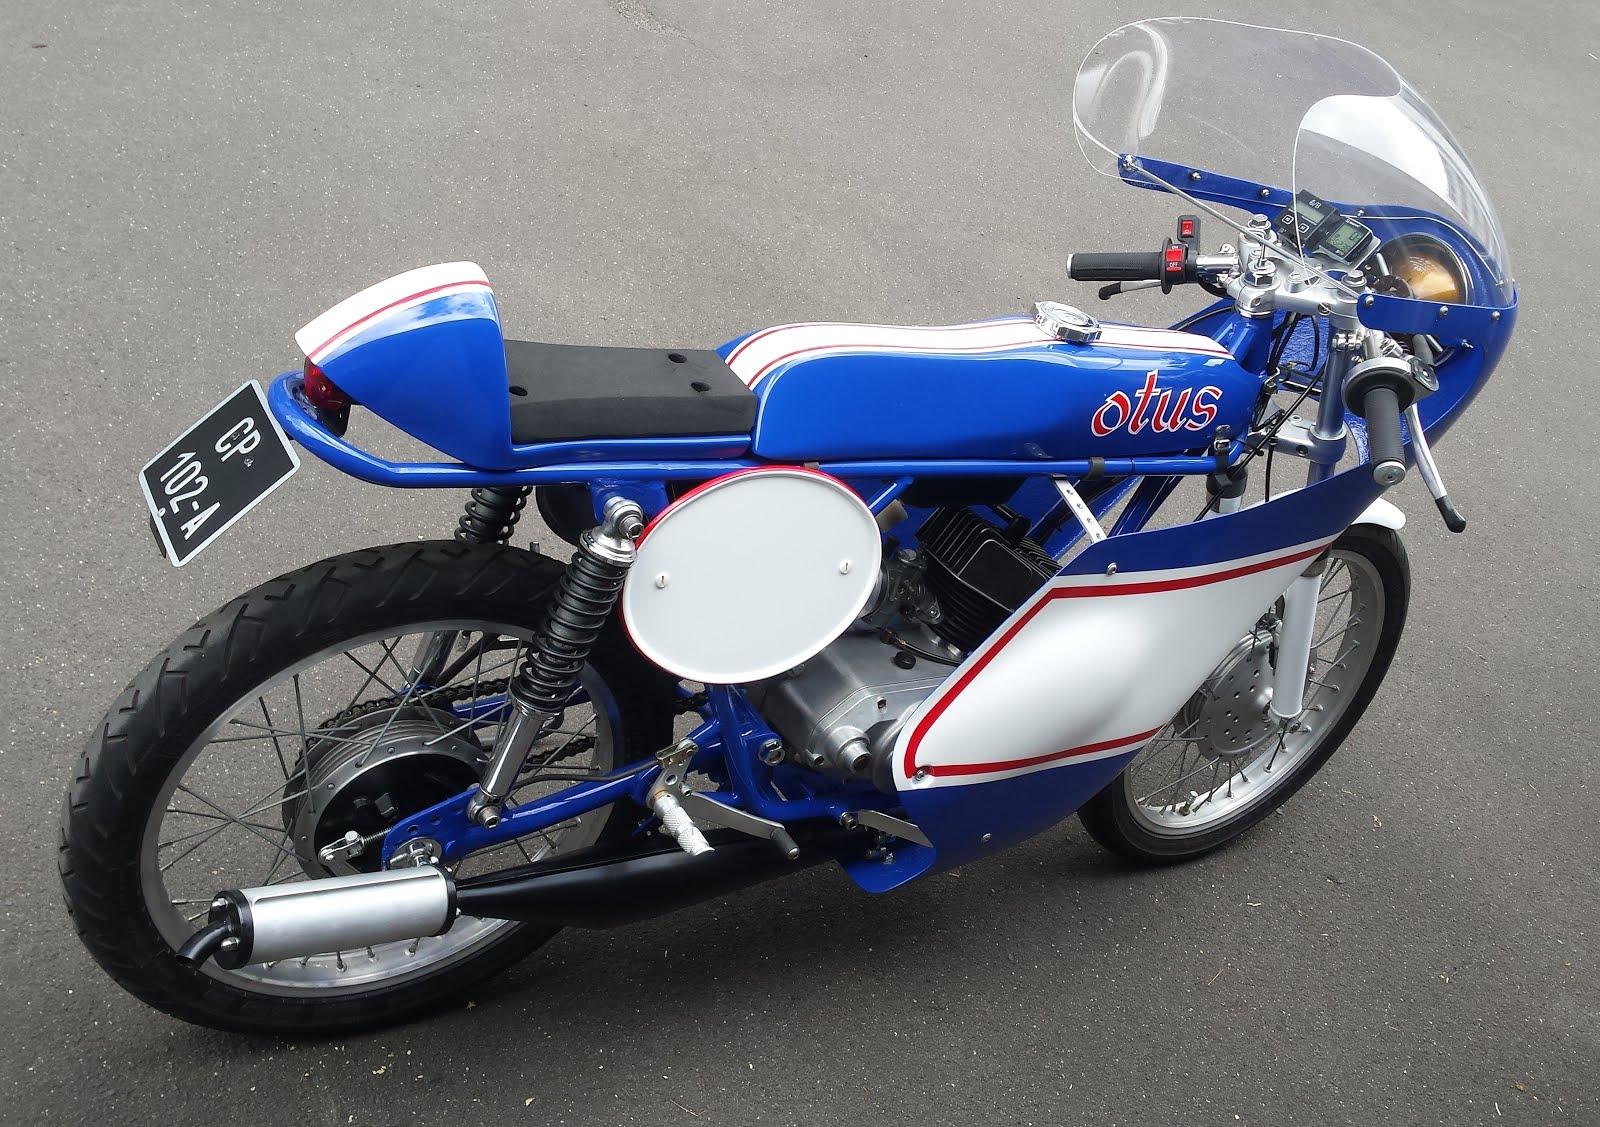 OTUS 50